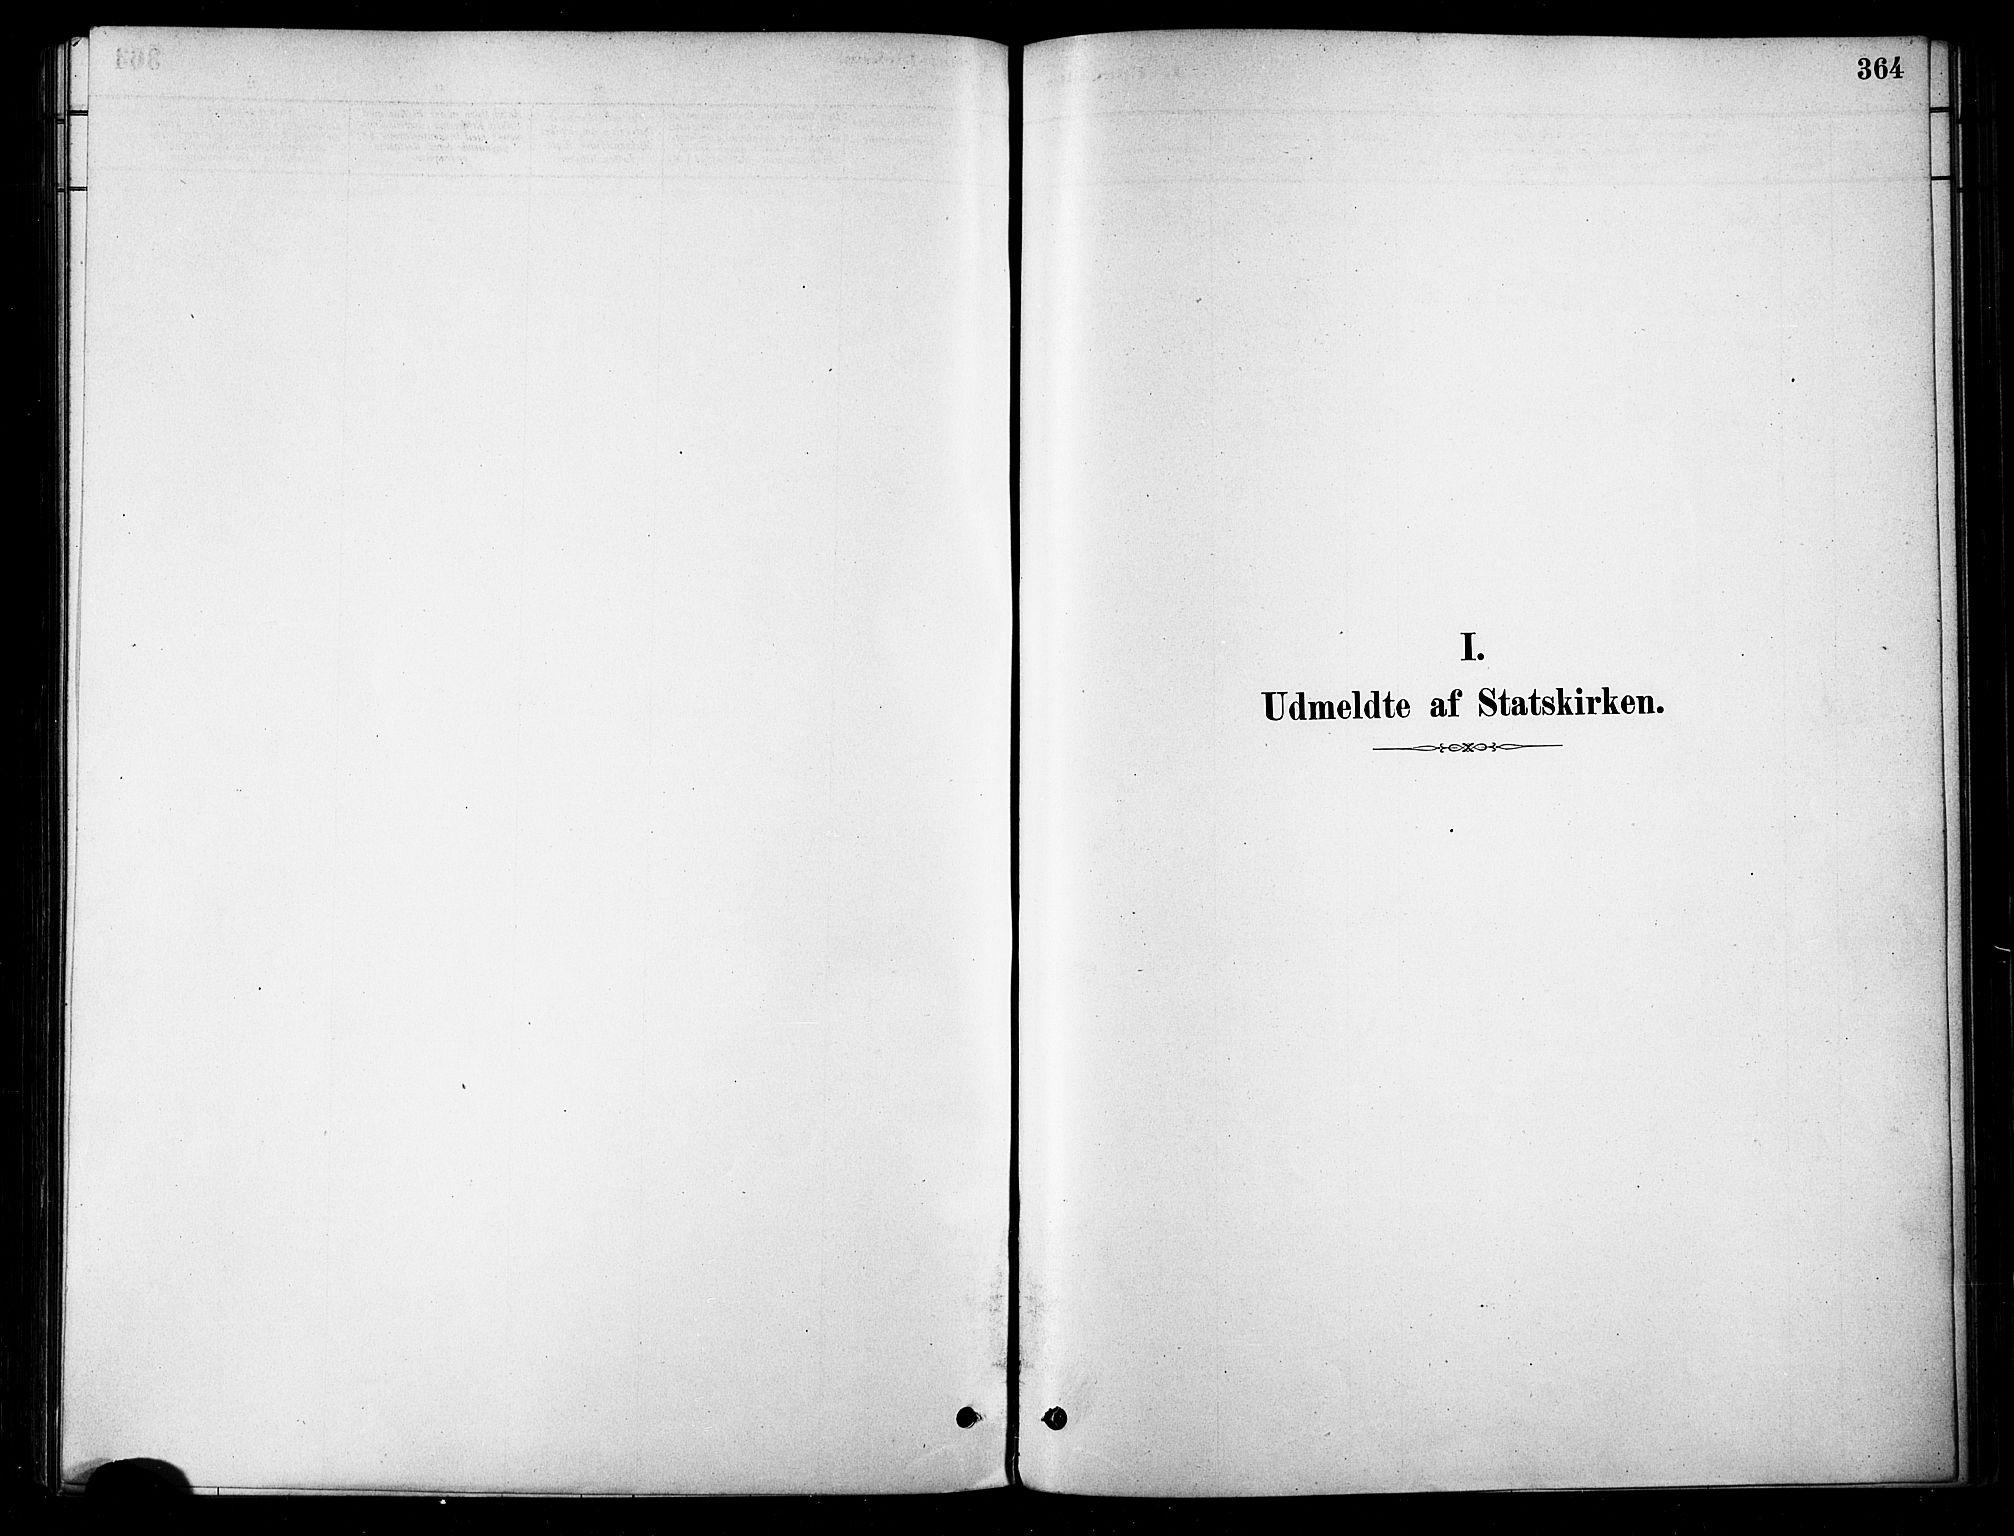 SATØ, Karlsøy sokneprestembete, H/Ha/Haa/L0006kirke: Ministerialbok nr. 6, 1879-1890, s. 364